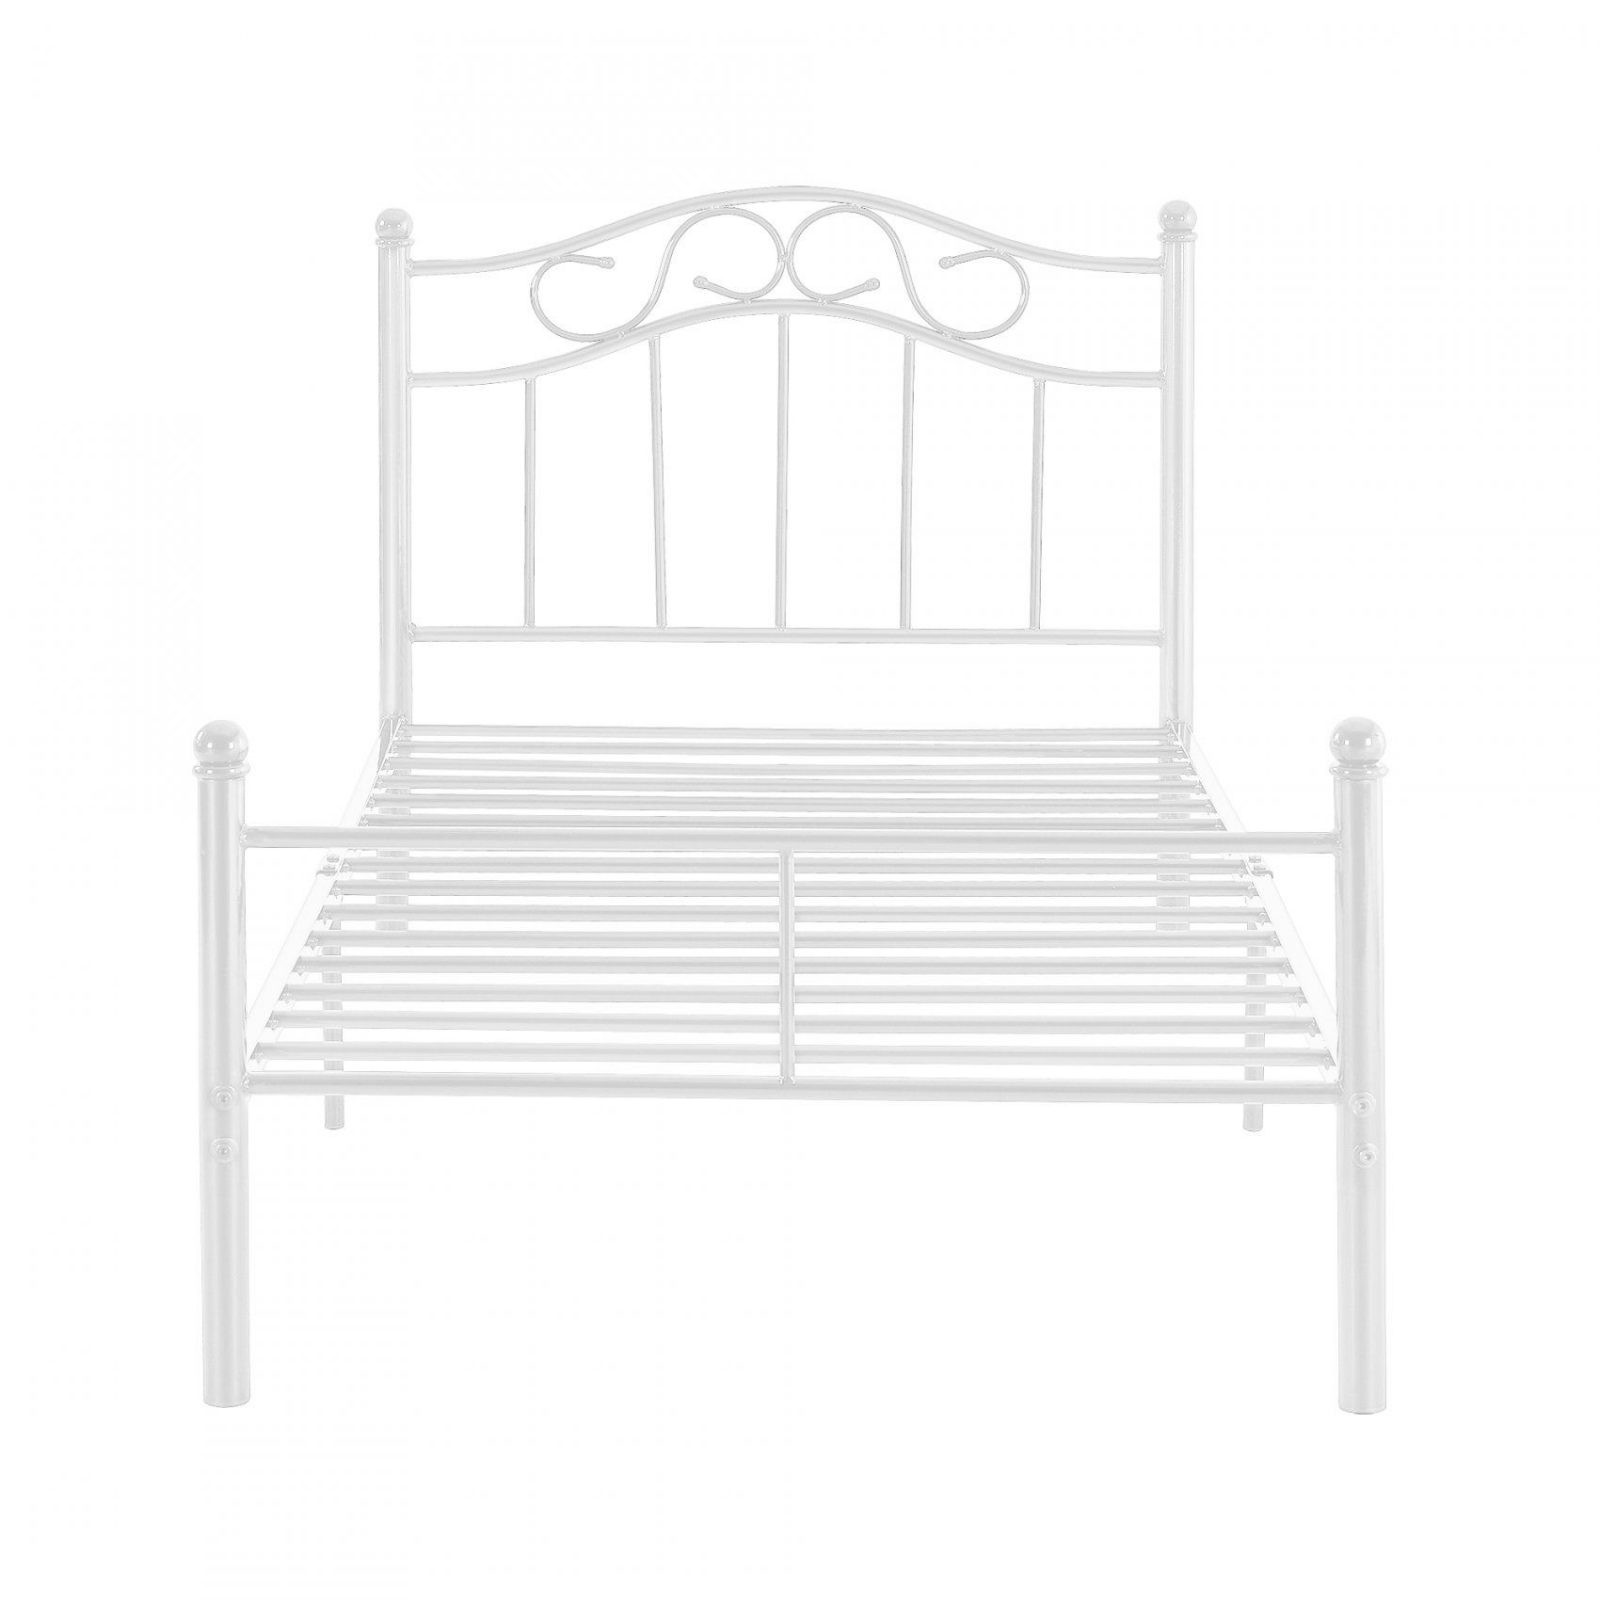 encasa metallbett 90x200 wei bettgestell bett schlafzimmer von bett metall wei 90x200 bild. Black Bedroom Furniture Sets. Home Design Ideas